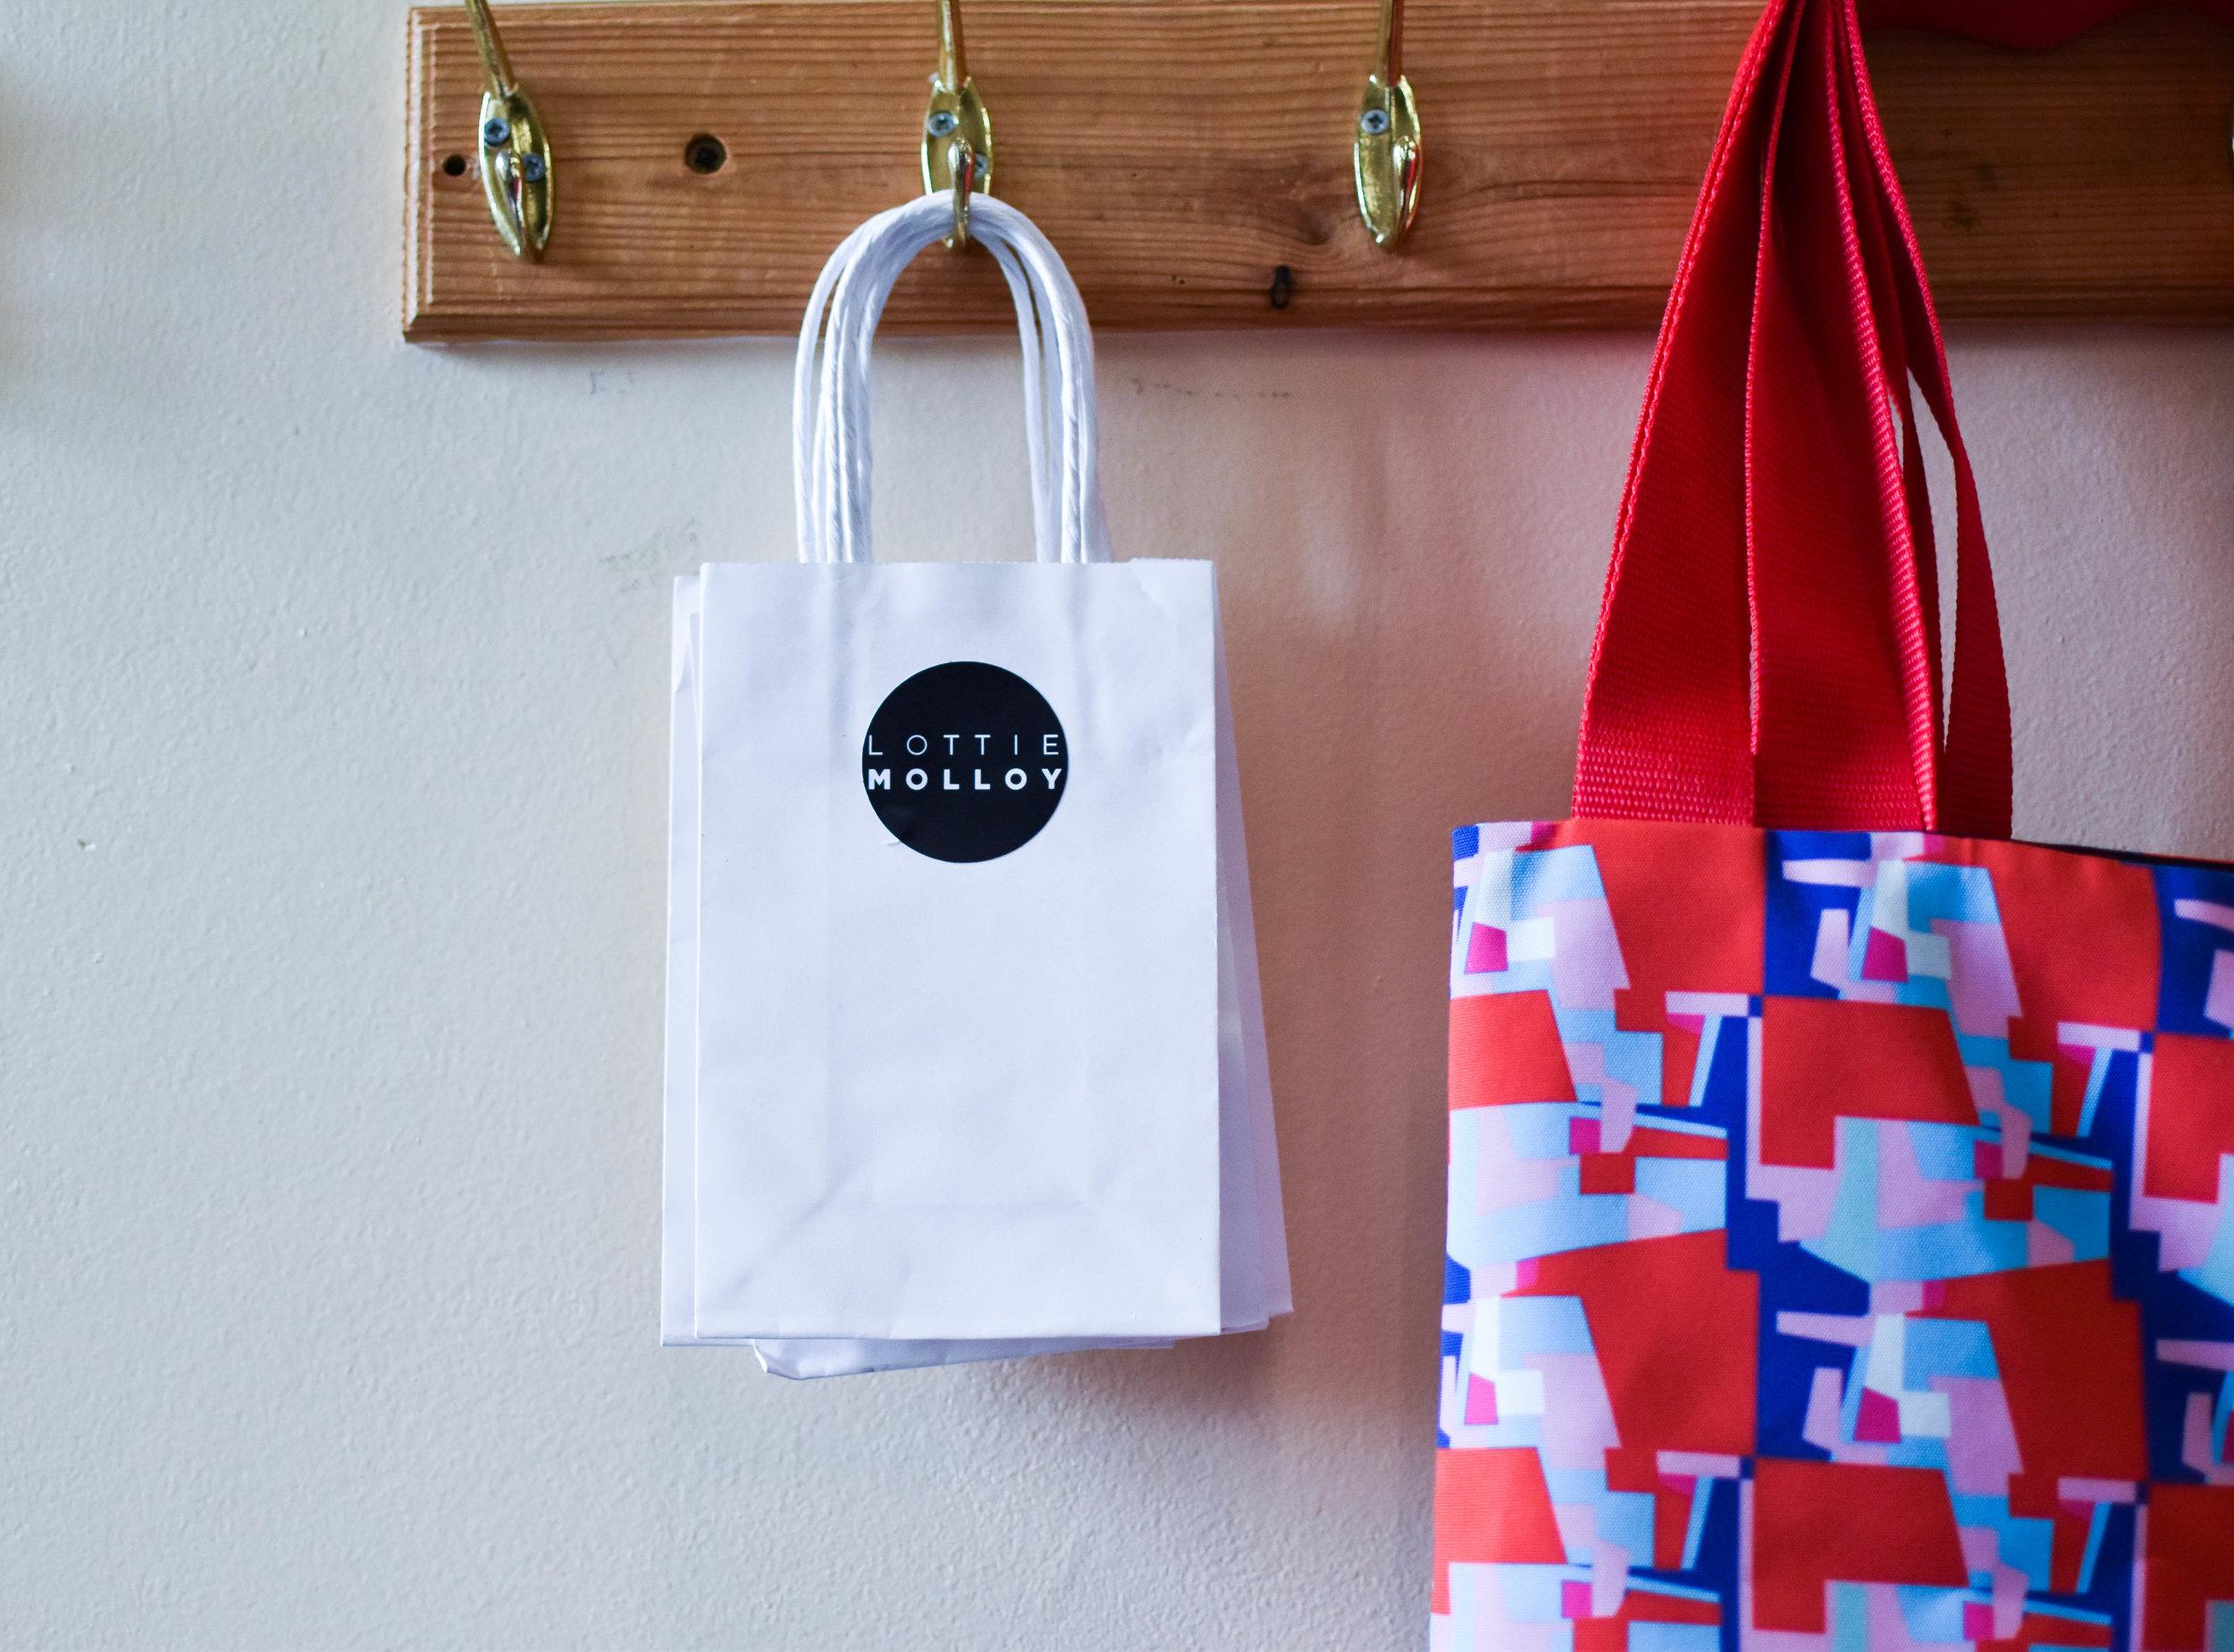 support-local-pop-up-market-fair-shopping-kent-whitstable.jpg4543.jpg